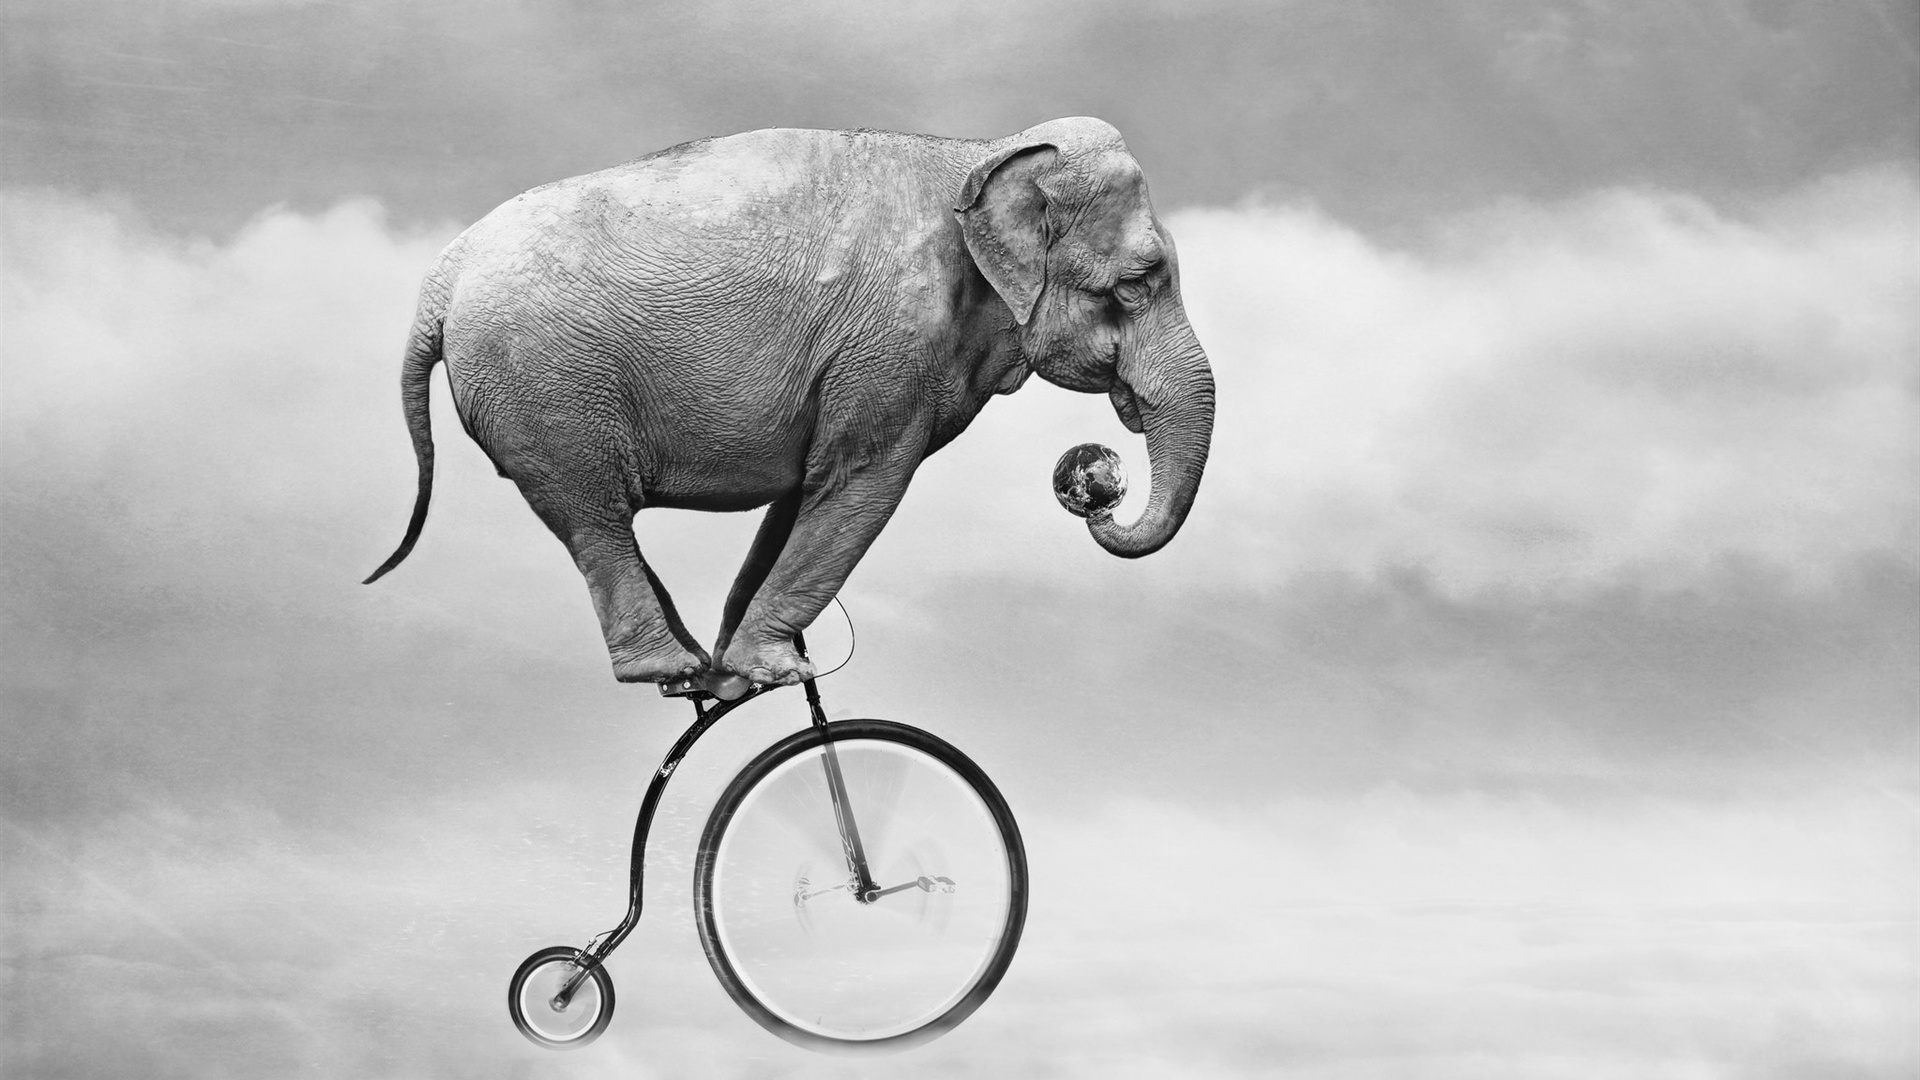 Elephant design wallpaper